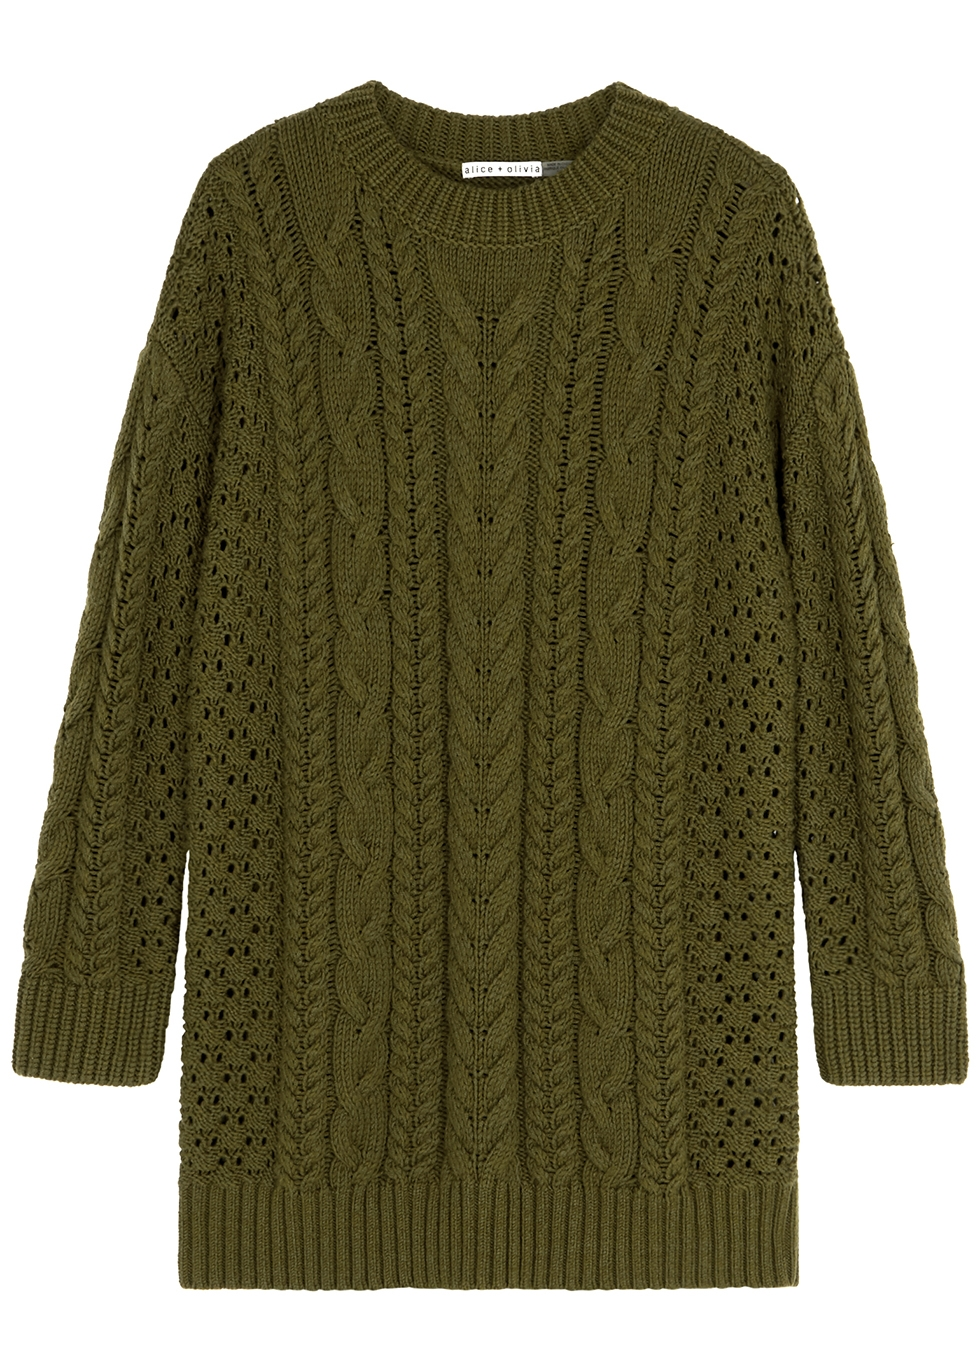 Lennie army green wool-blend jumper dress